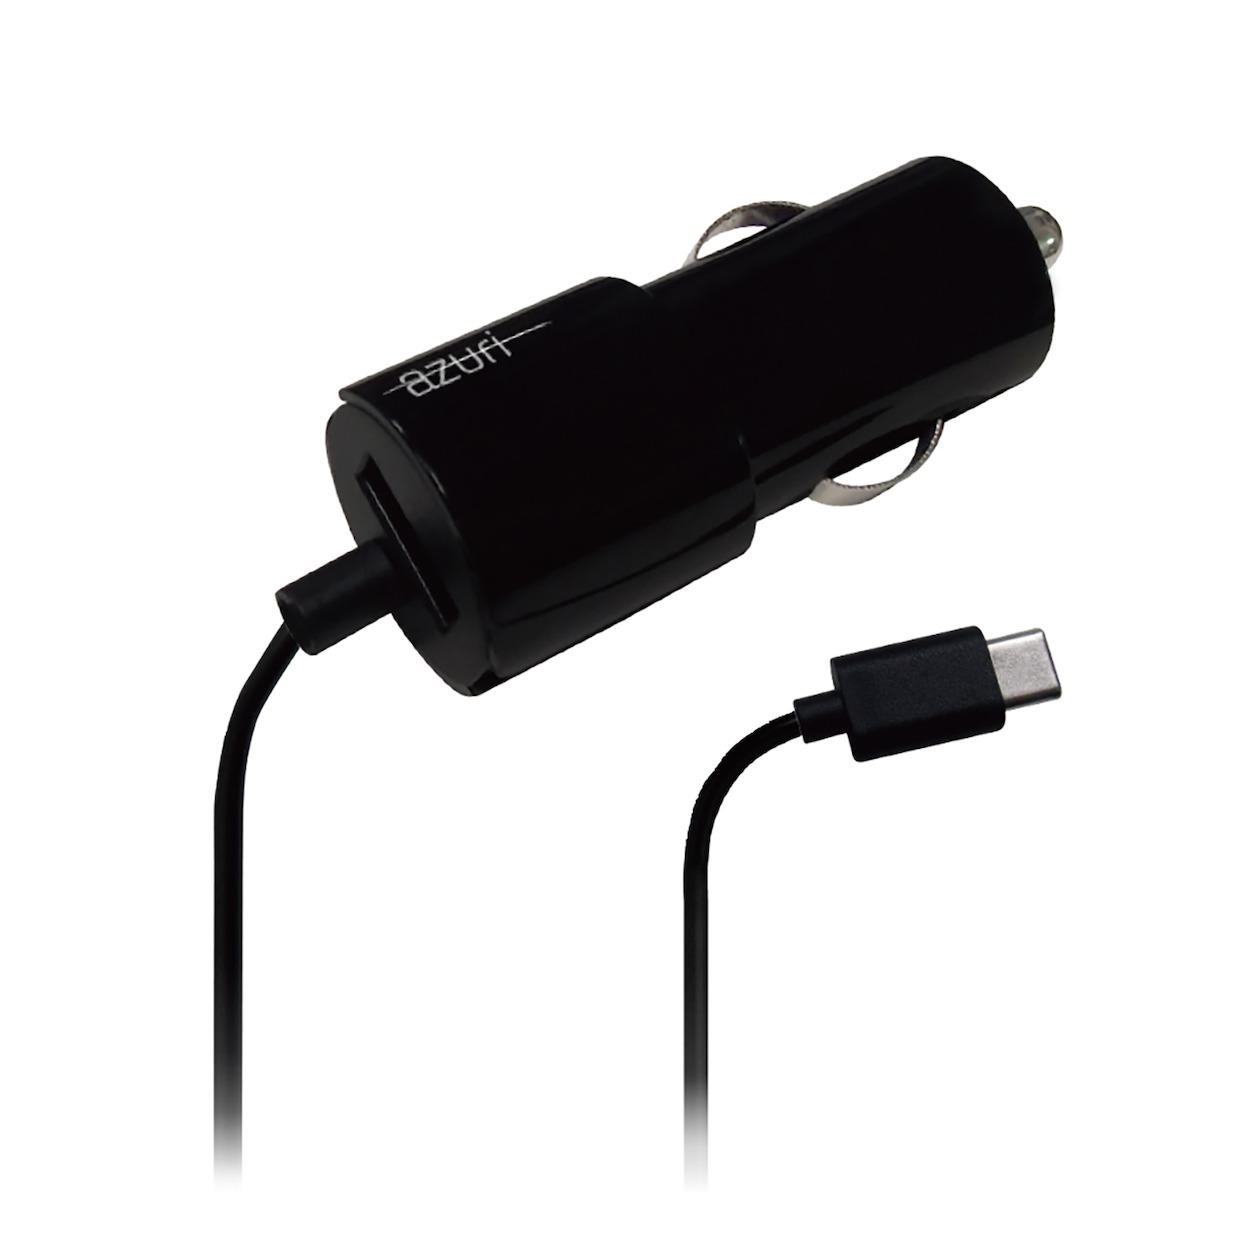 Afbeelding van Azuri oplader Autolader USB-C met extra USB 2.4amp 1.2m zwart